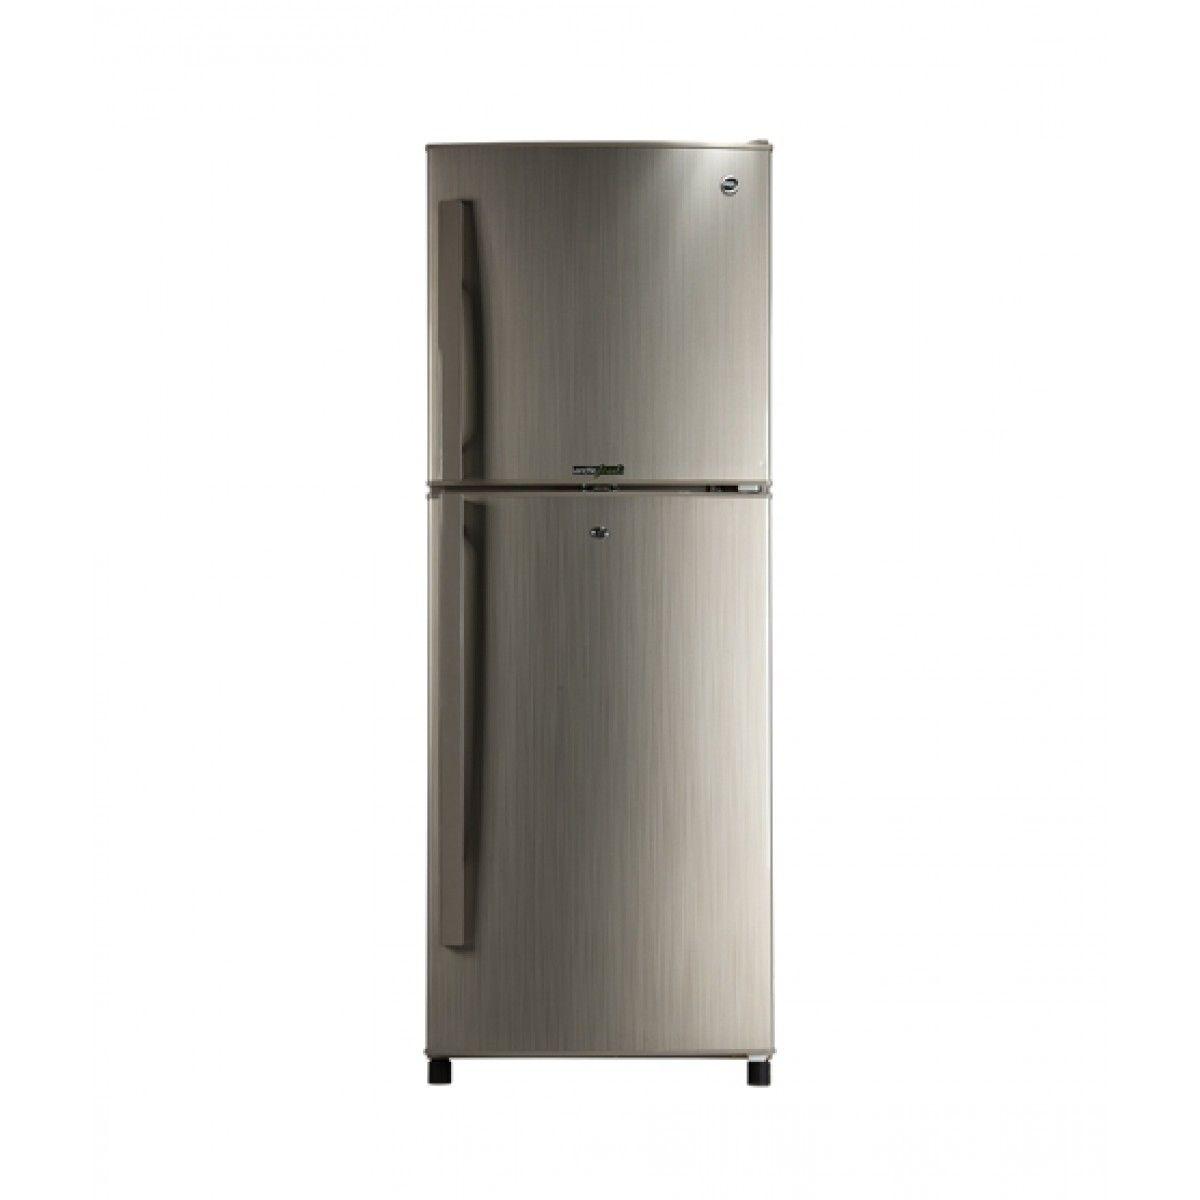 PEL PRAF 2550 Arctic Fresh Refrigerator